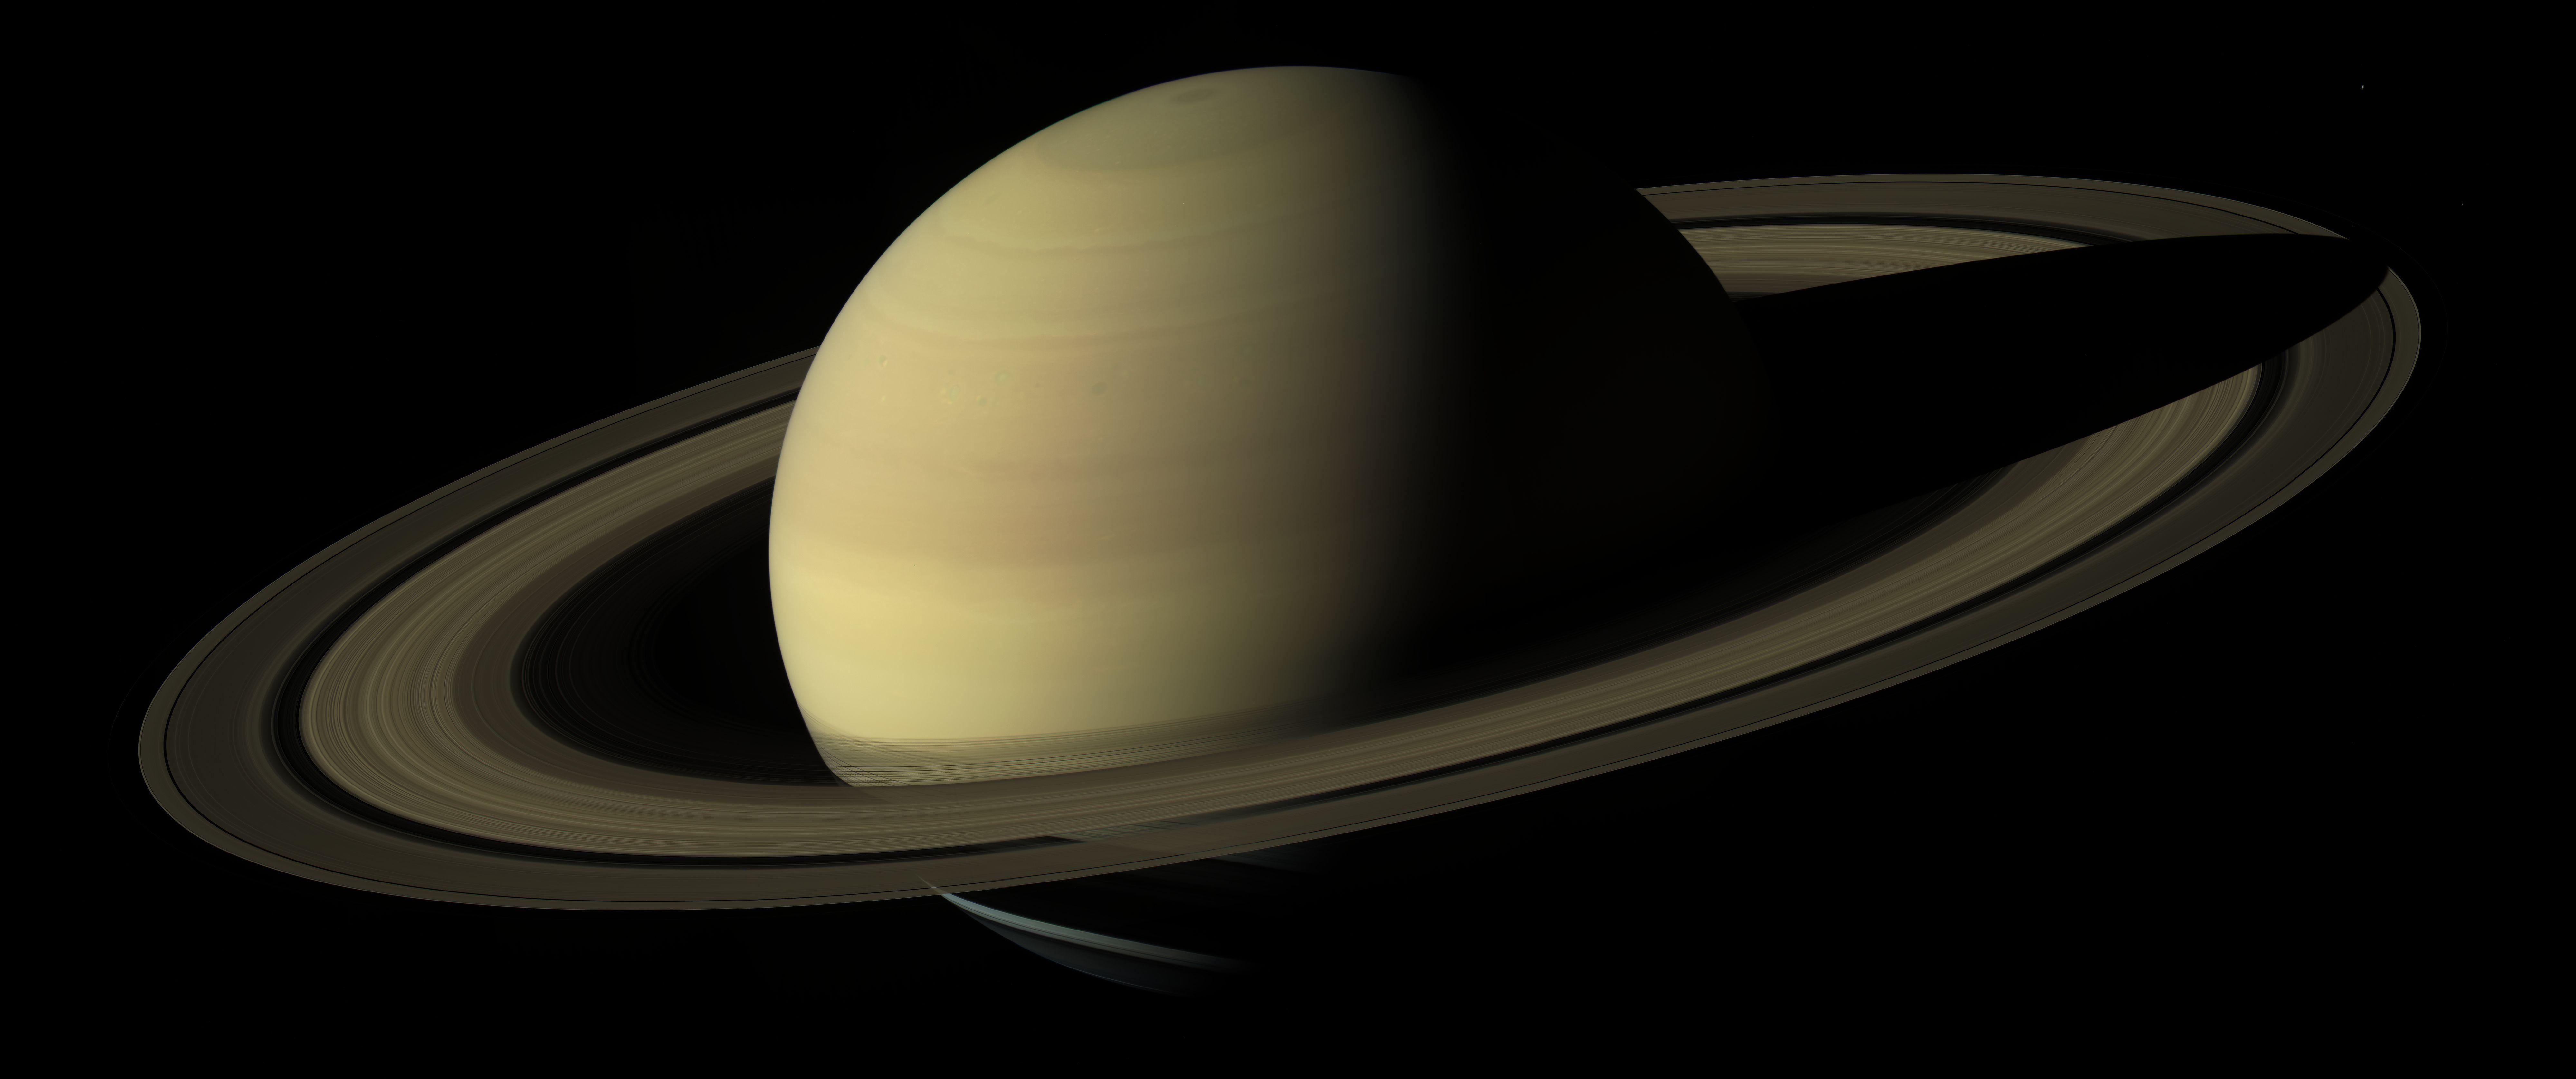 72 Best Free Saturn 4K Wallpapers - WallpaperAccess